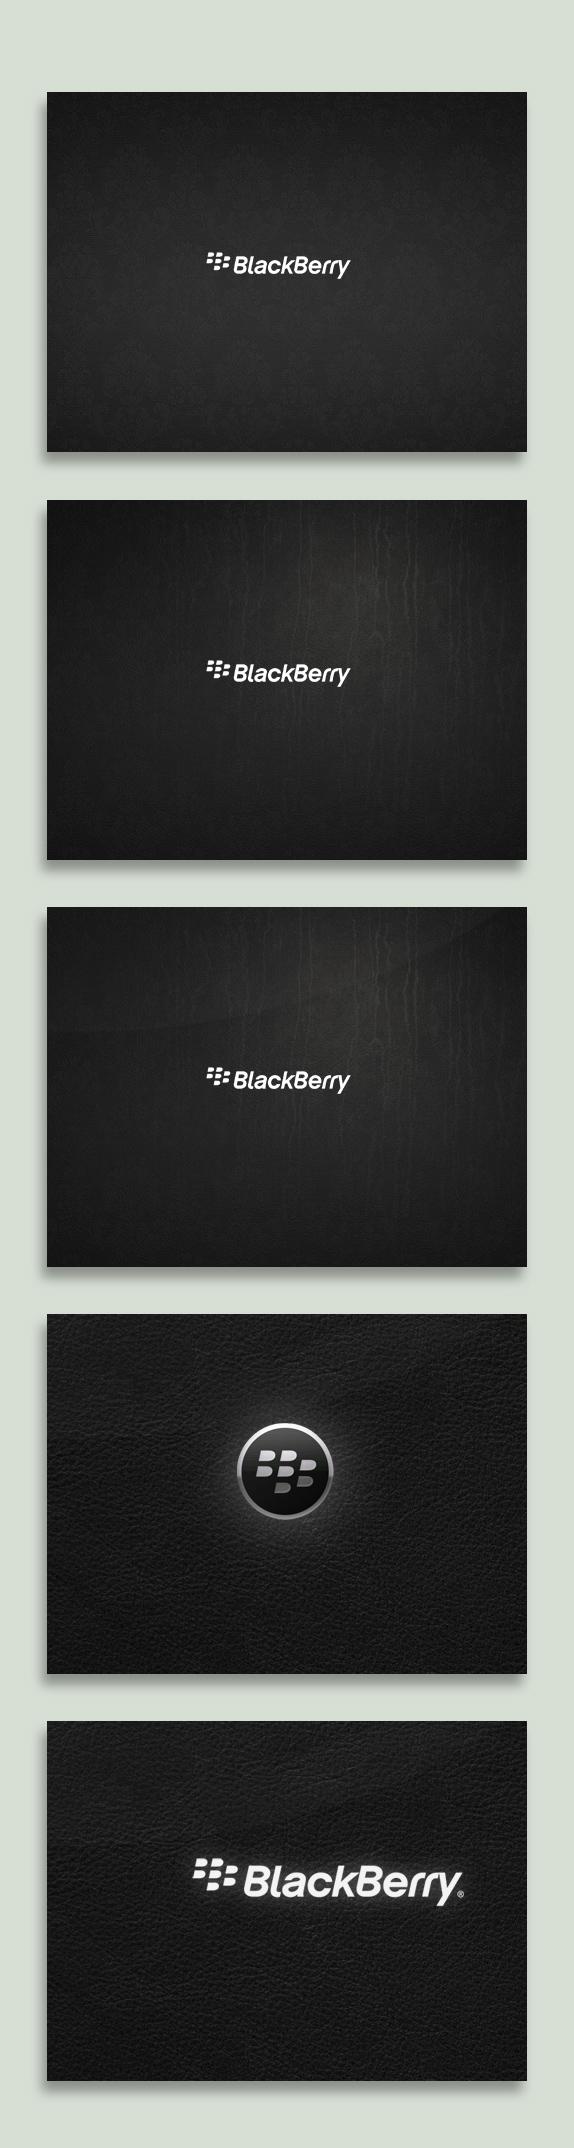 blackberry backgrounds.